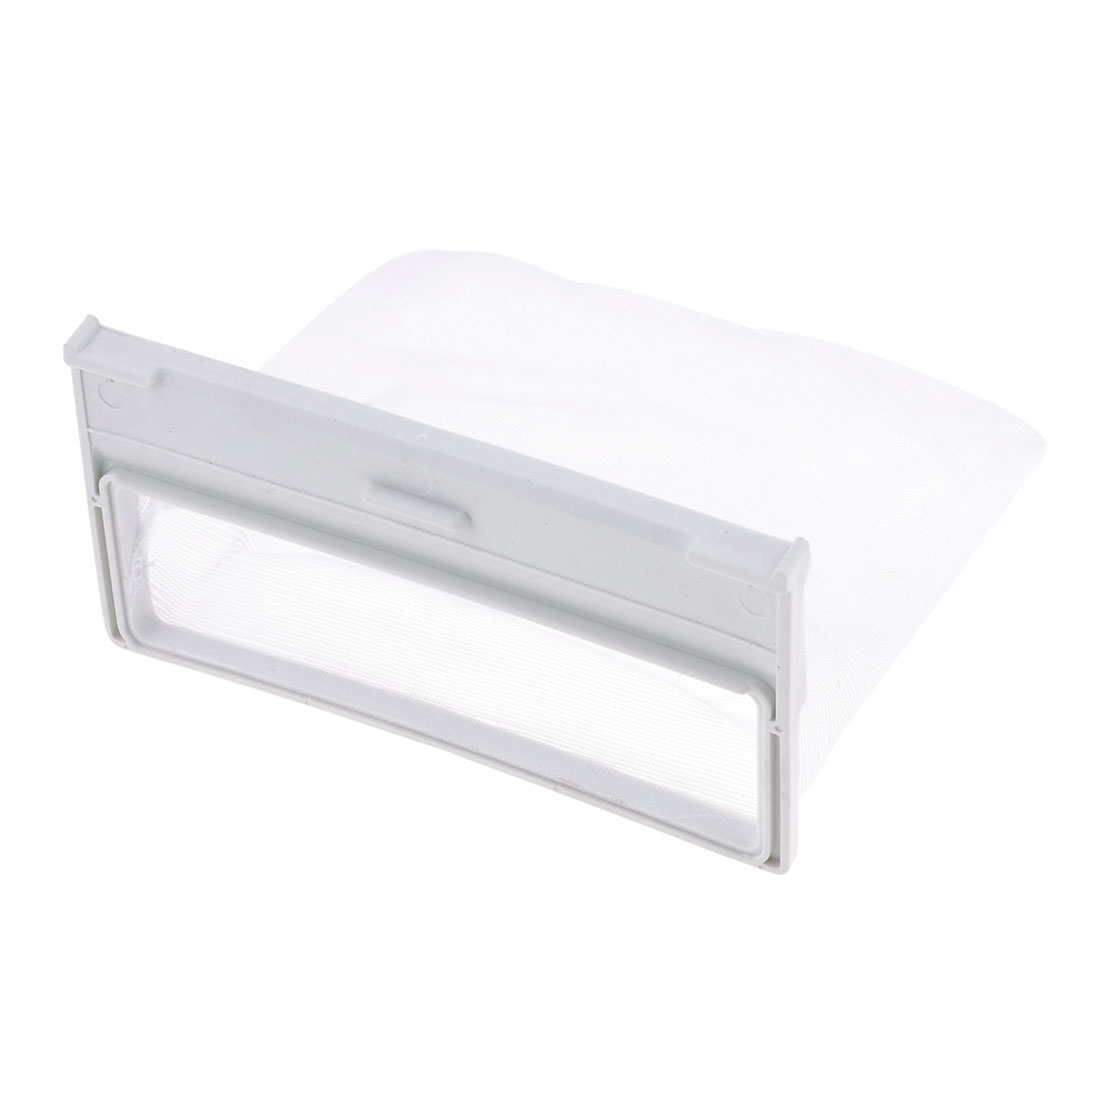 Washing Machine White Plastic Nylon Filter 15cm x 12cm Meshy Bag